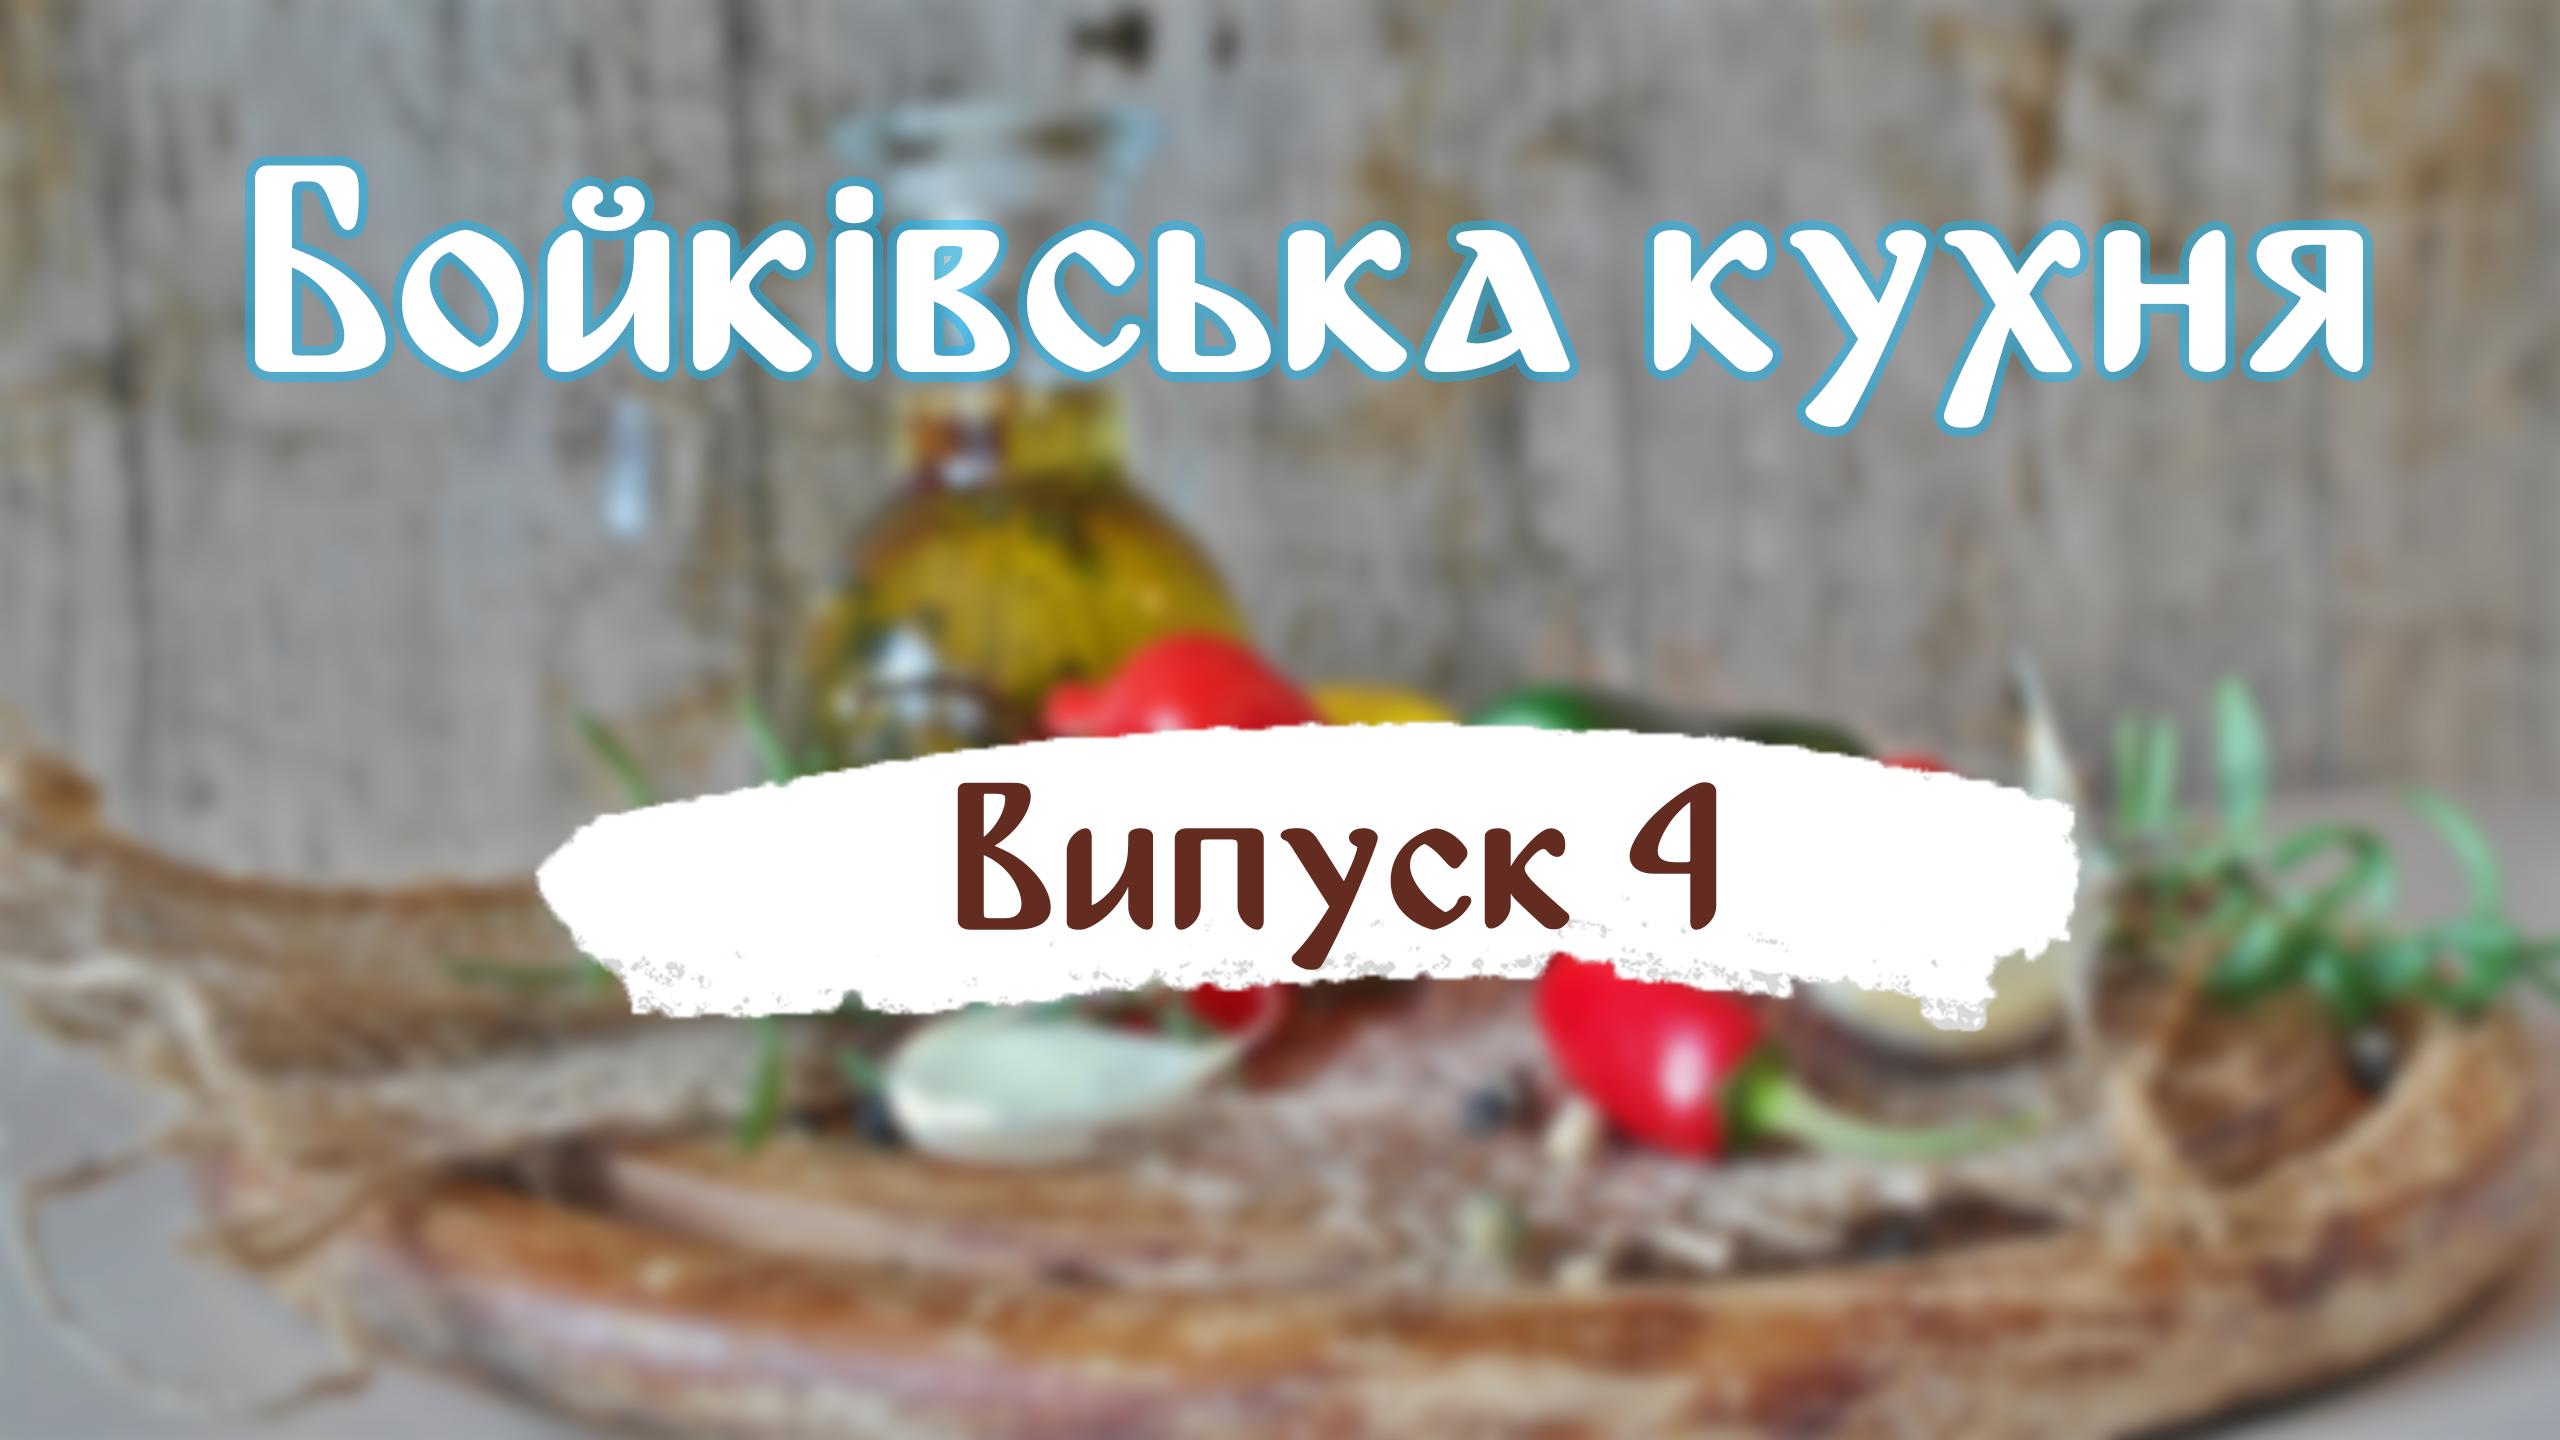 Read more about the article Бойківська кухня. Випуск 4. Борщ волоцюга.